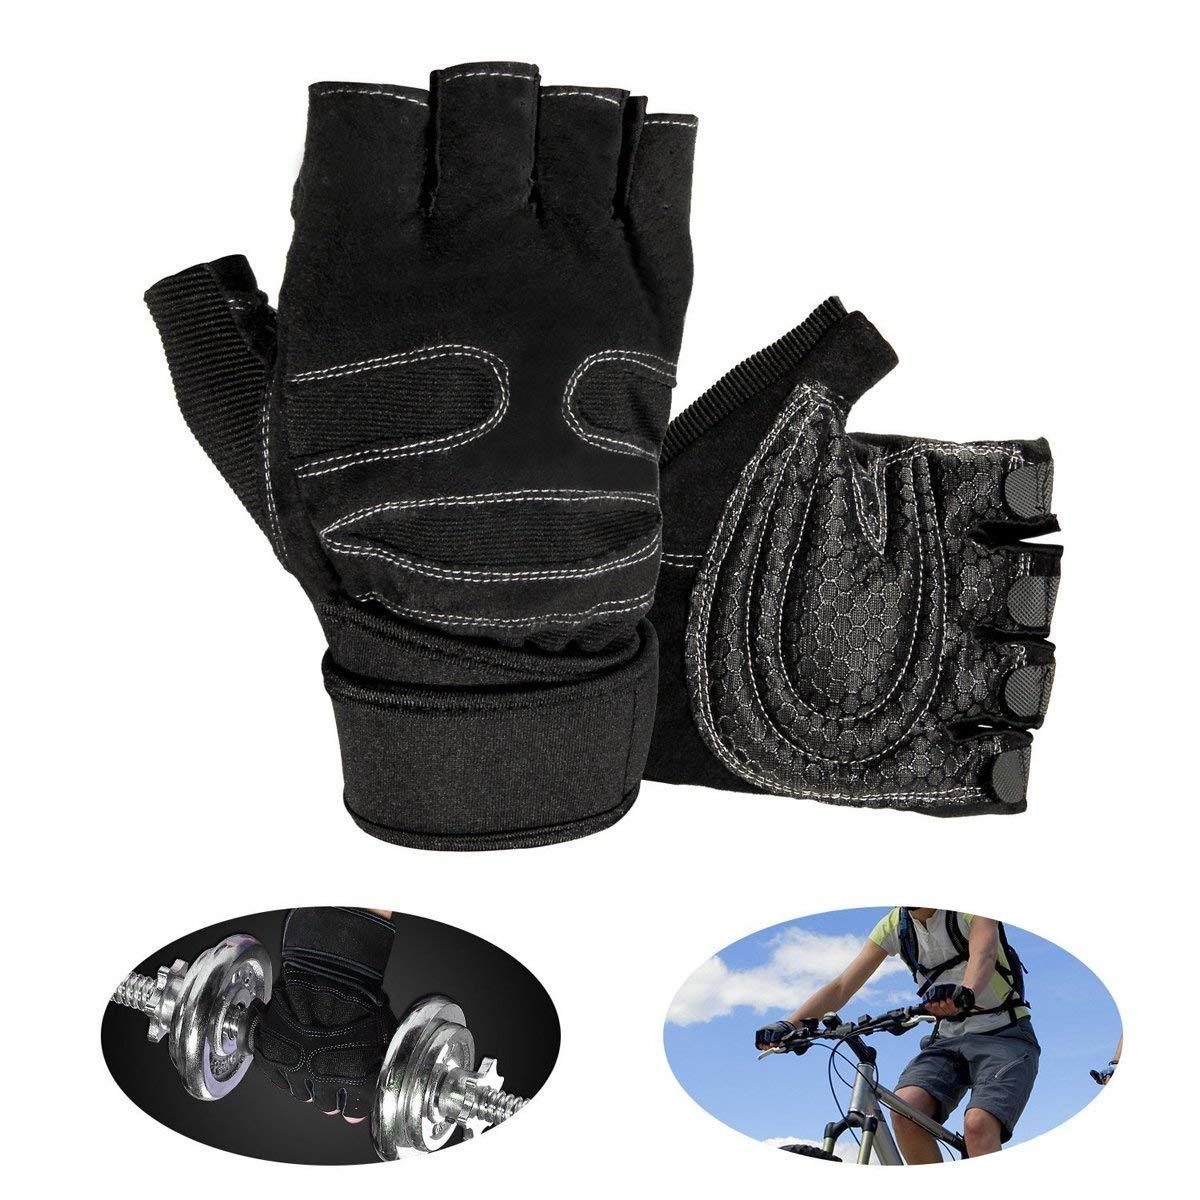 LEBEXY Fitness Training Handschuhe Fahrrad Grips mit Adjustable Handgelenkstütze